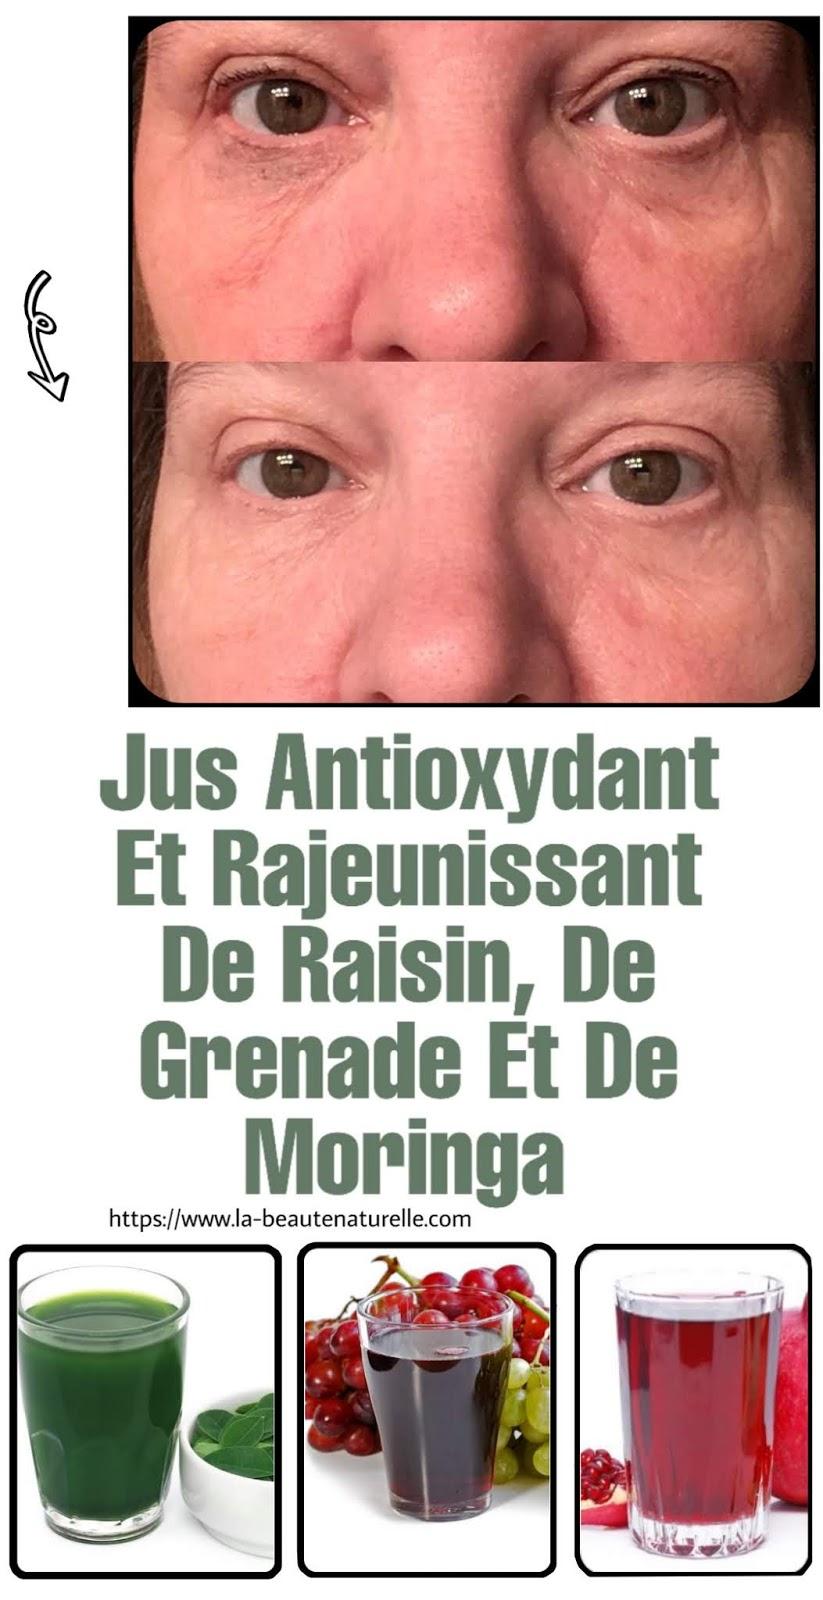 Jus Antioxydant Et Rajeunissant De Raisin, De Grenade Et De Moringa